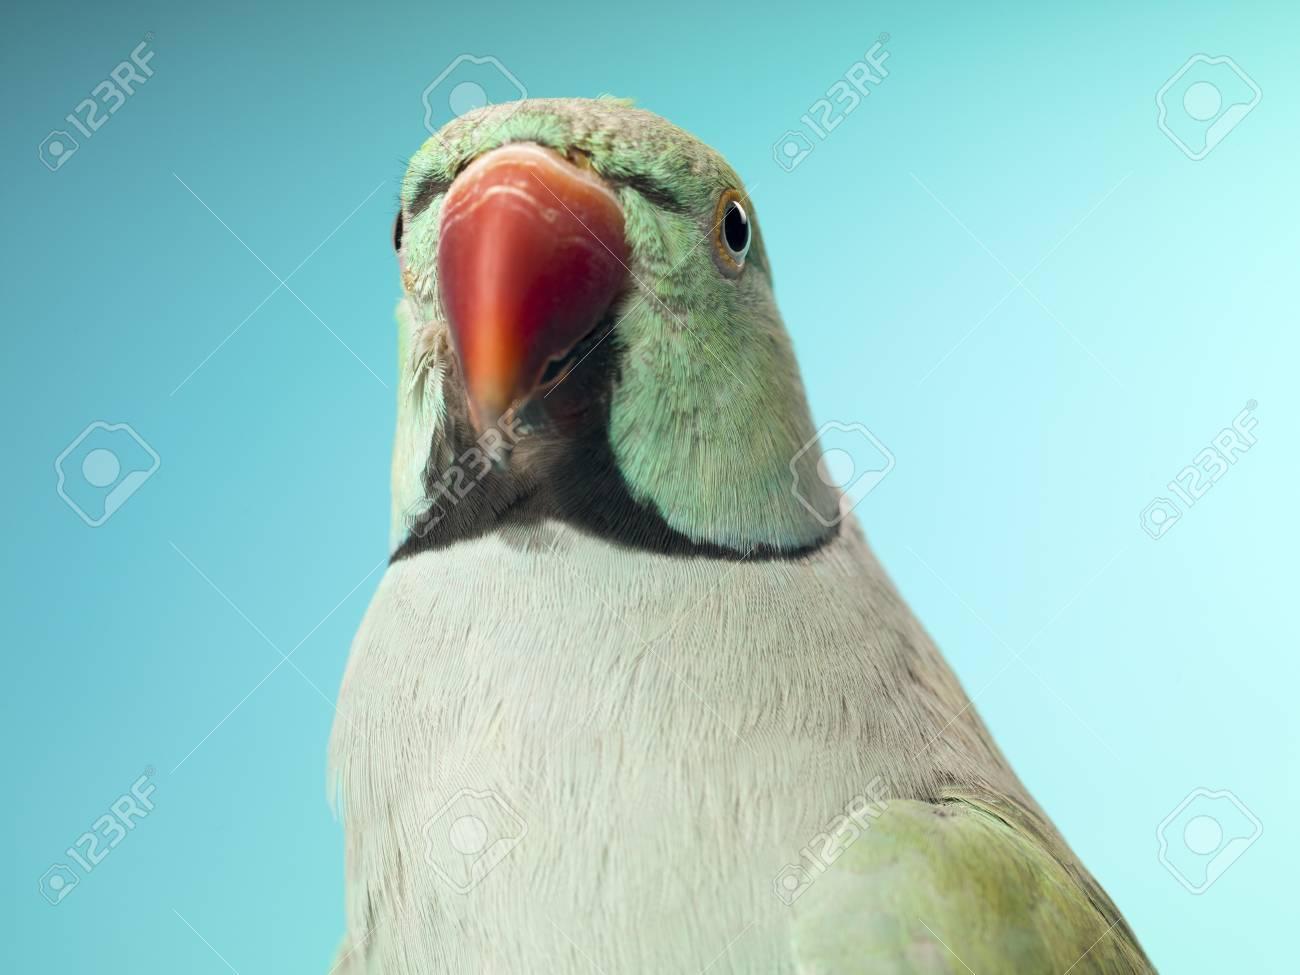 Close-up shot of a parrot. Stock Photo - 16995087